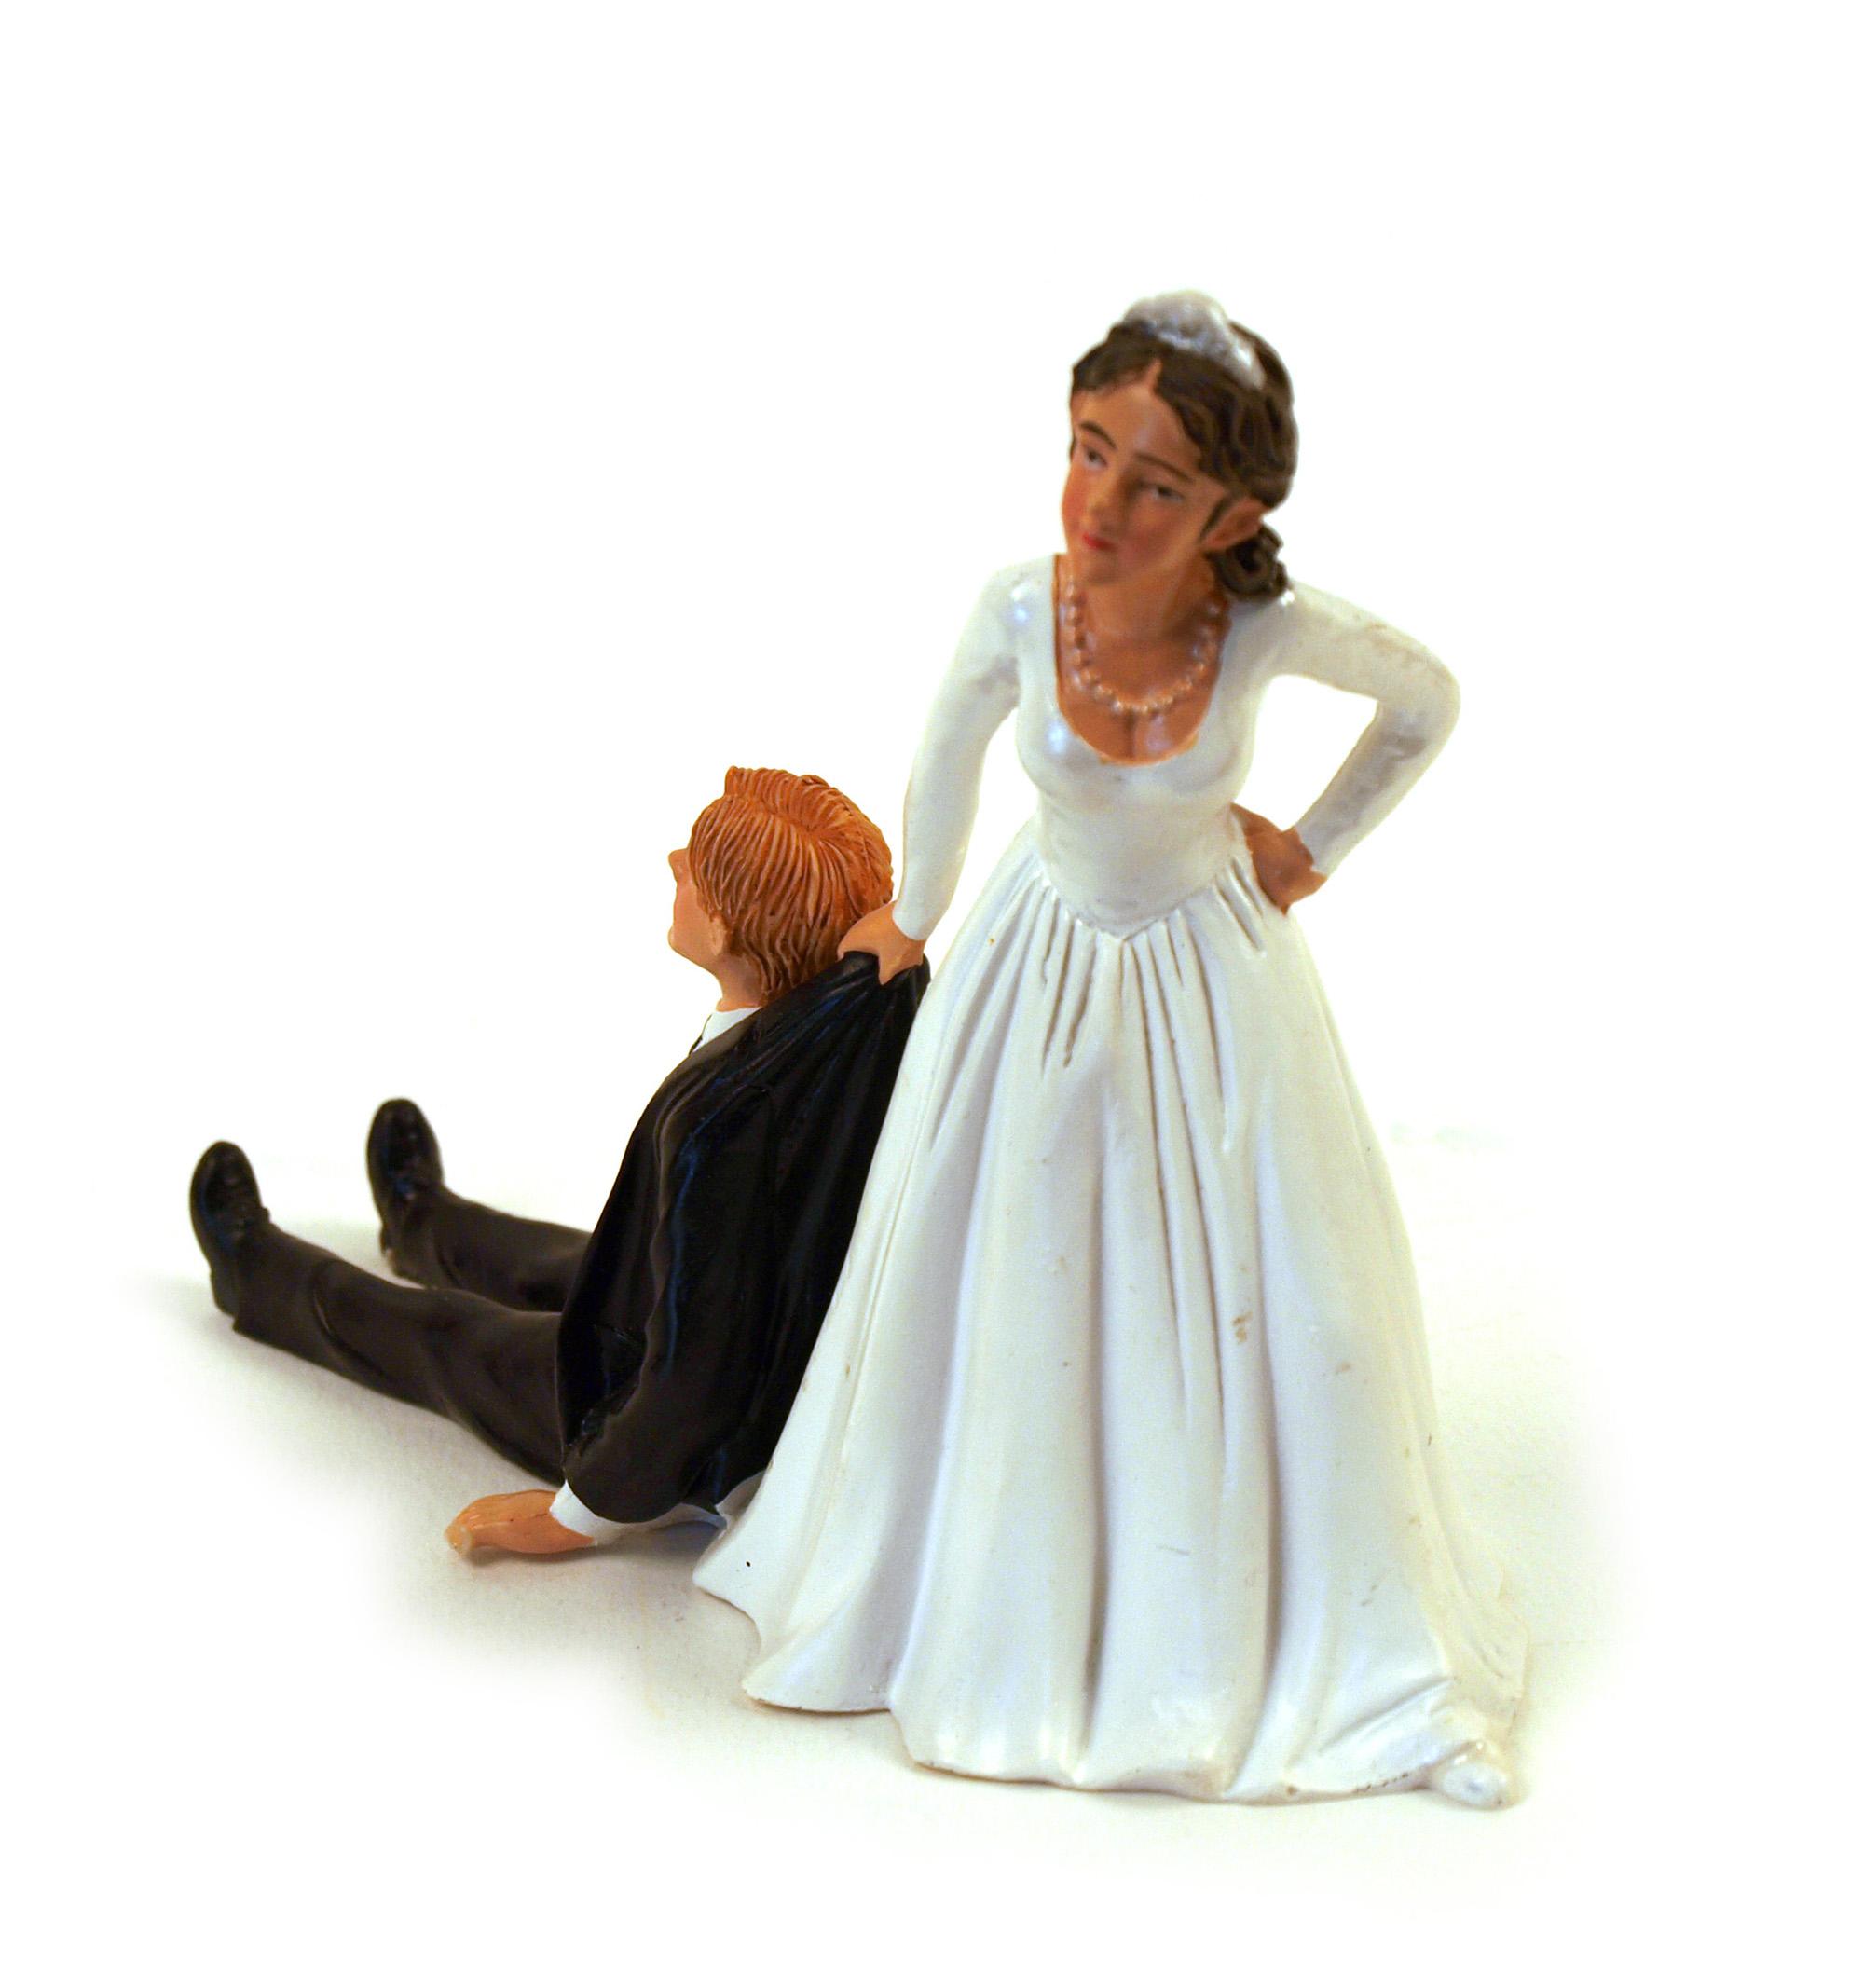 RELUCTANT GROOM CAKE TOPPER WEDDING BRIDE NEW FUNNY BRIDAL